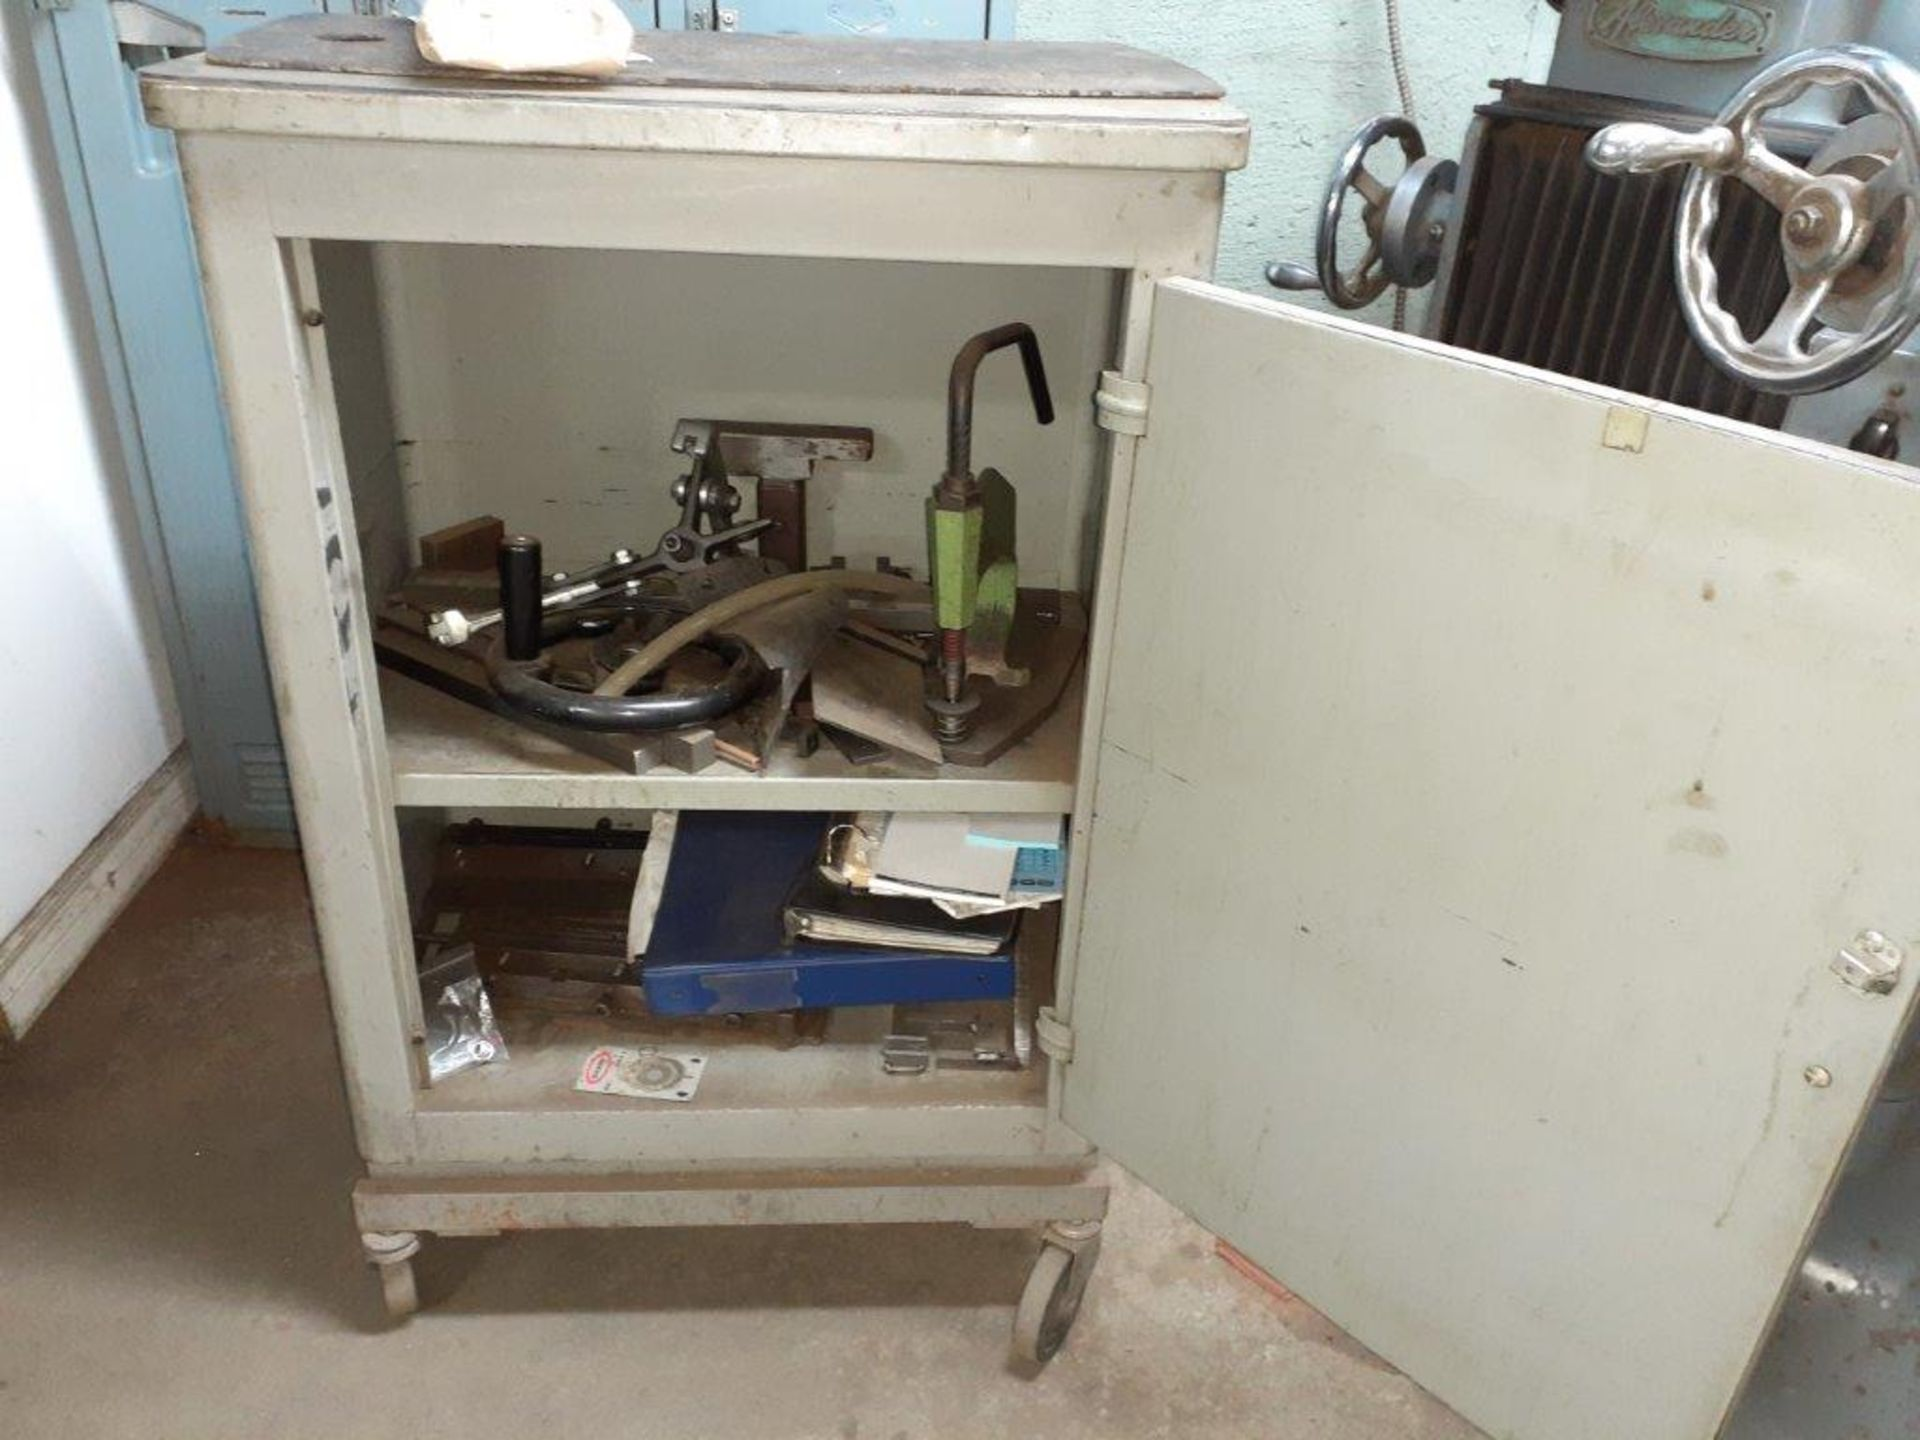 ALEXANDER PENTAGRAPH Machine, mod: 3A, c/w Metal Cabinet & Assorted Parts - Image 6 of 8